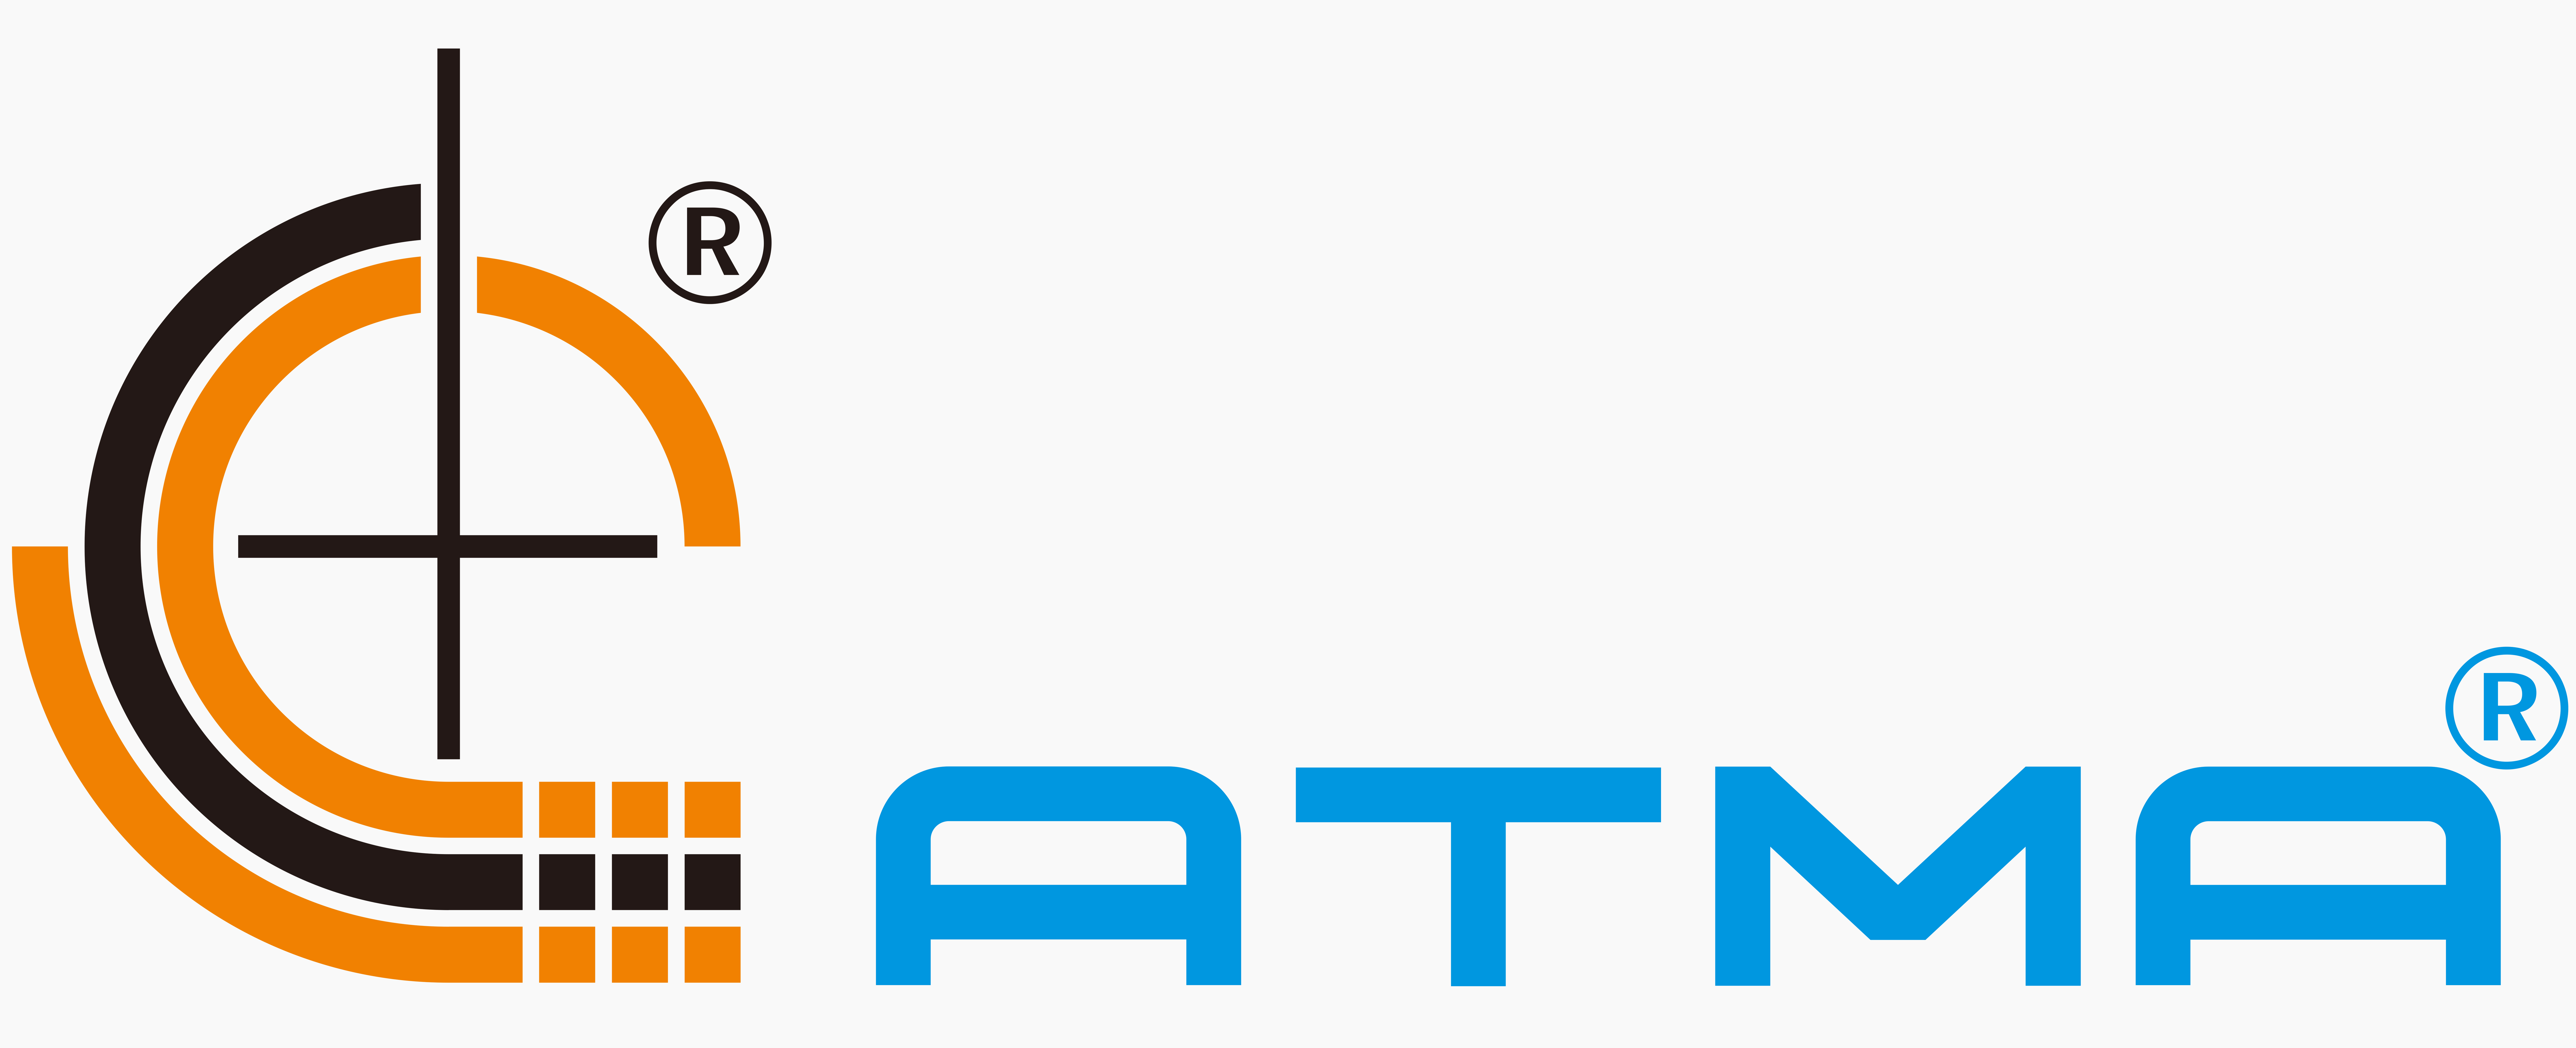 ATMA מייצג אוטומציה אוטומטית של מכונות טייוואן או טונג יואן.